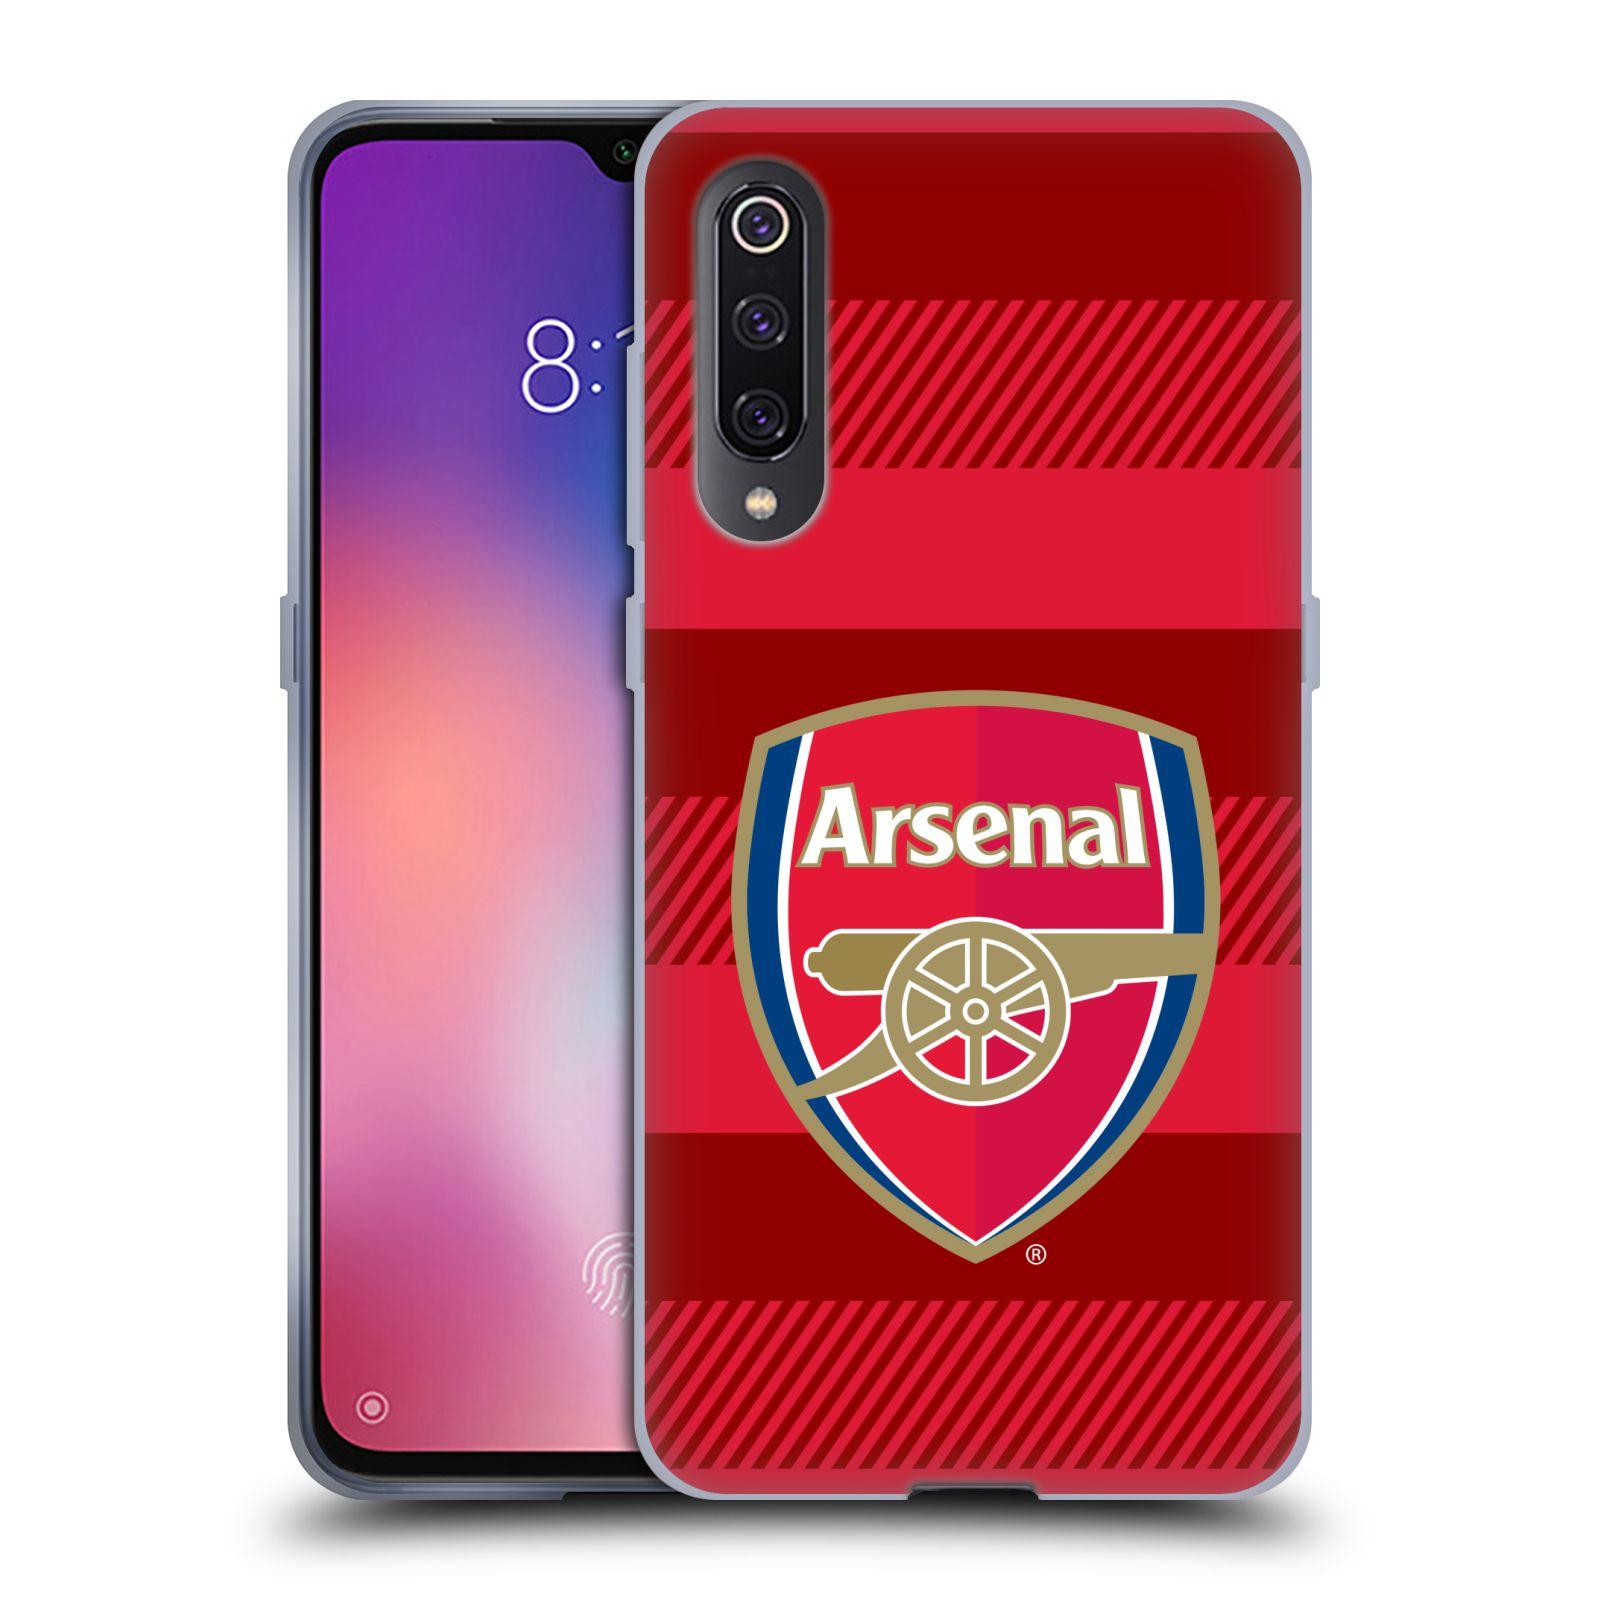 Silikonové pouzdro na mobil Xiaomi Mi 9 - Head Case - Arsenal FC - Logo s pruhy